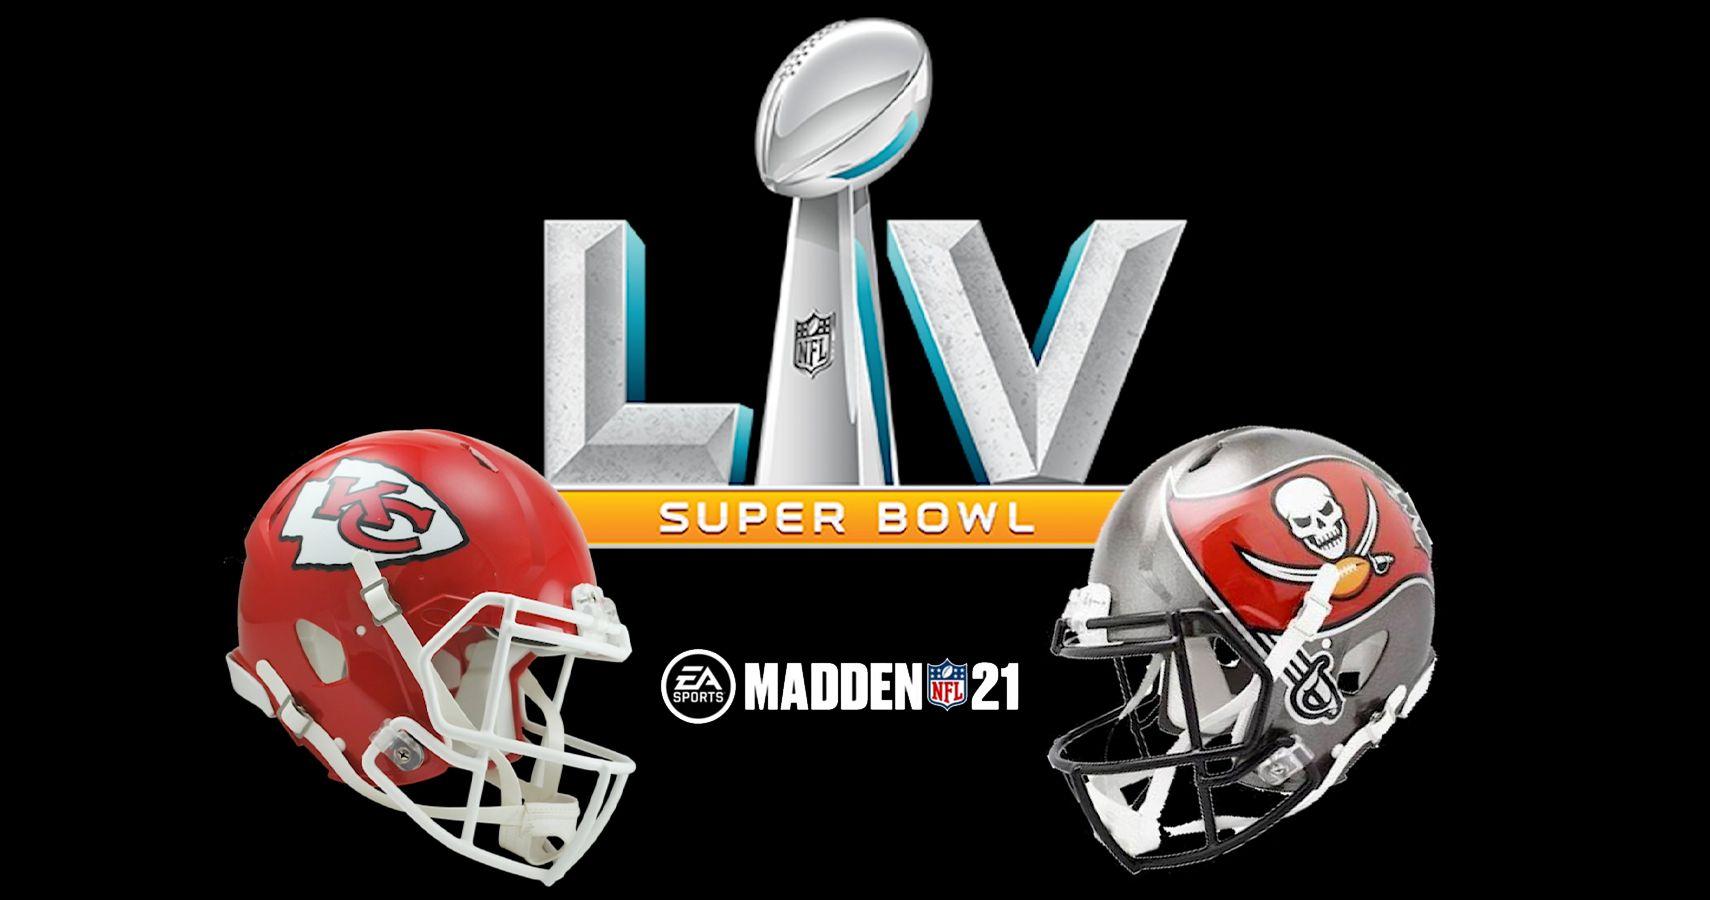 TheGamer's Madden 21 Super Bowl LV Prediction – And The Winner Is…